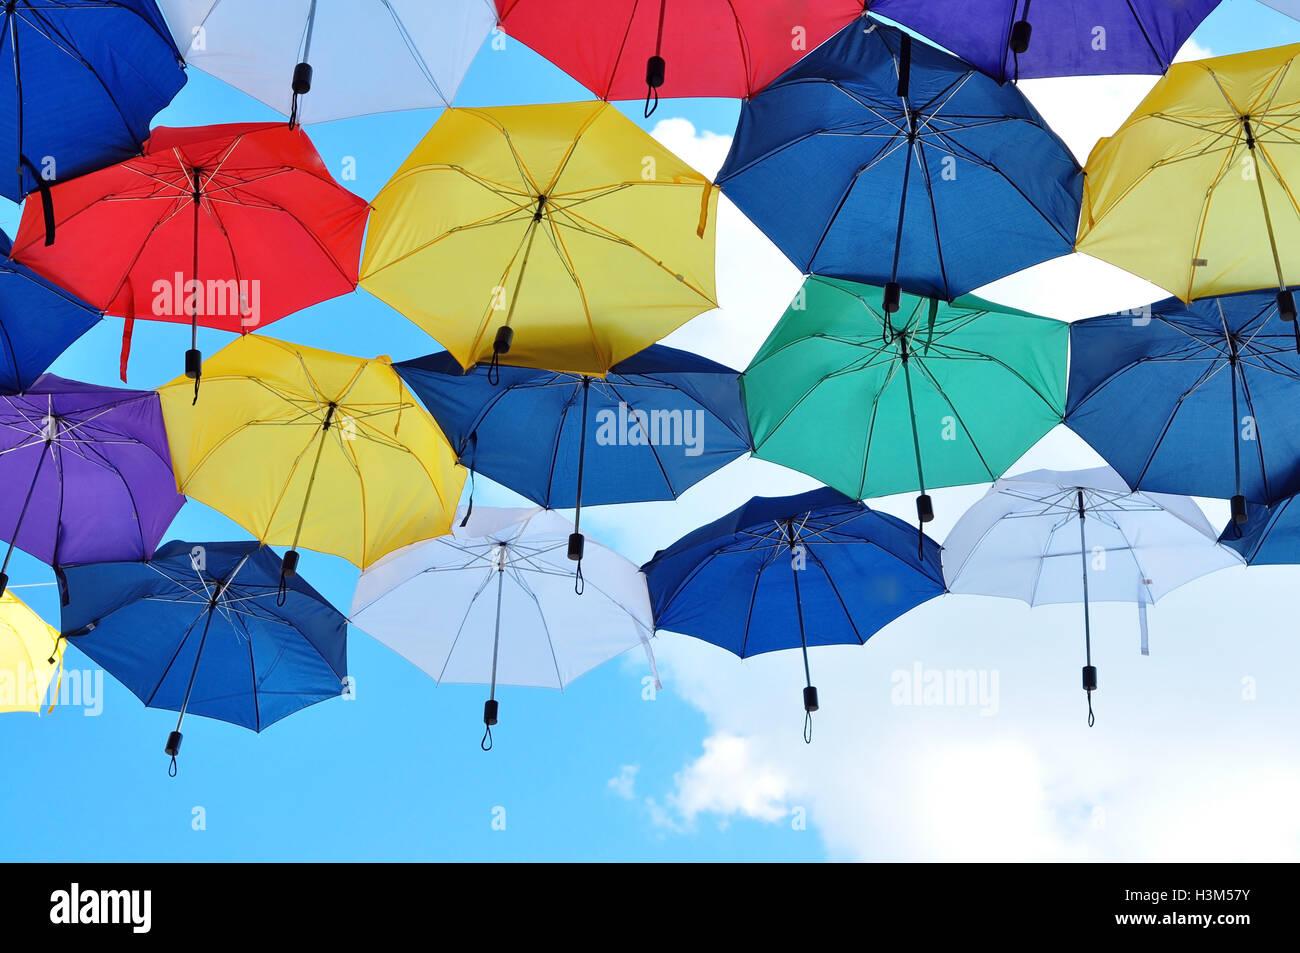 Umbrella sky - Stock Image